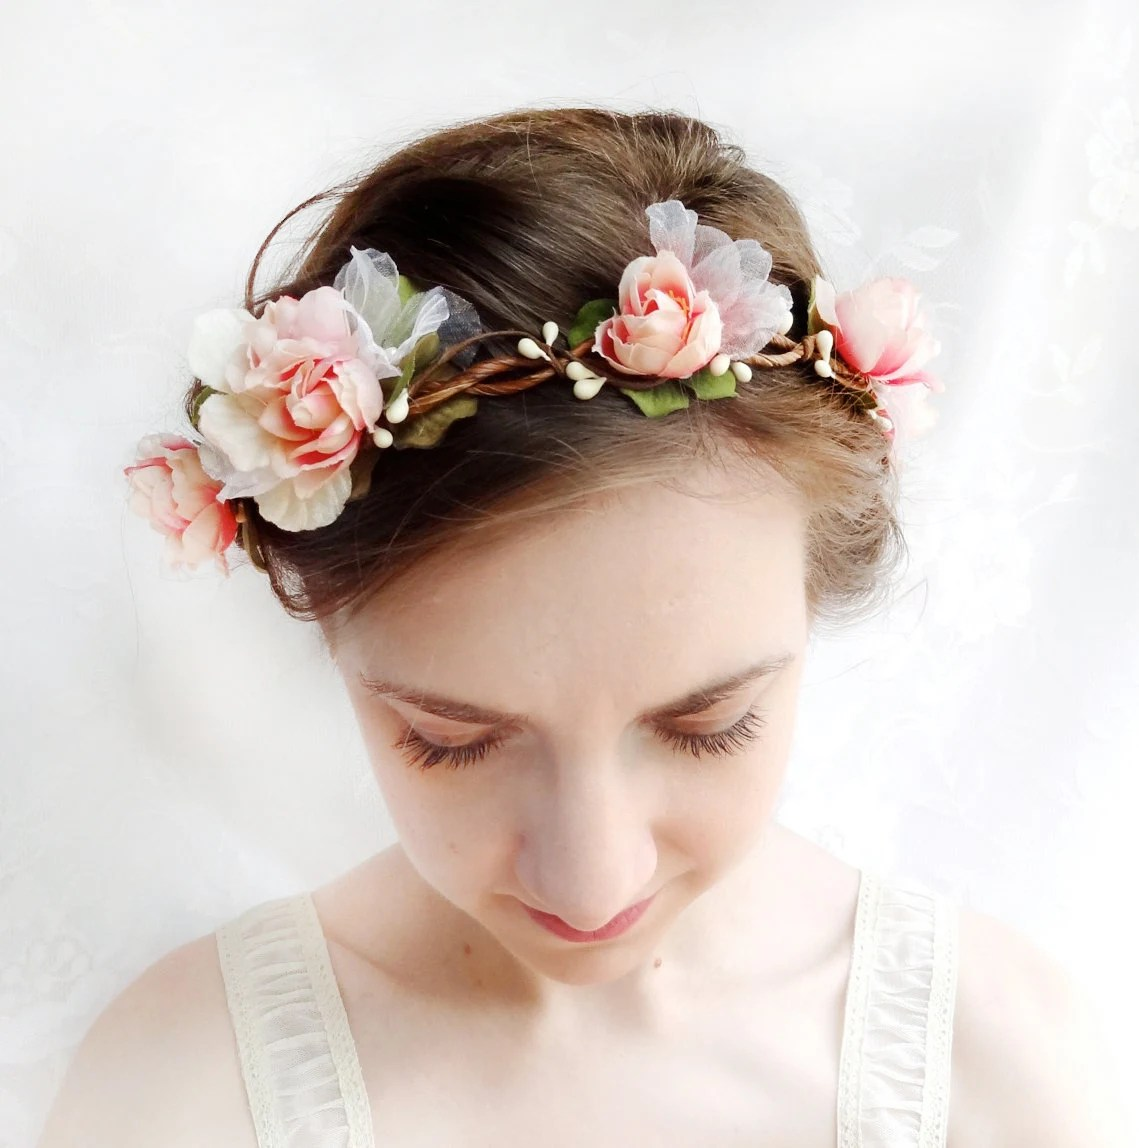 Pink Flower Bridal Wreath Bridal Headpiece Blush Pink Hair